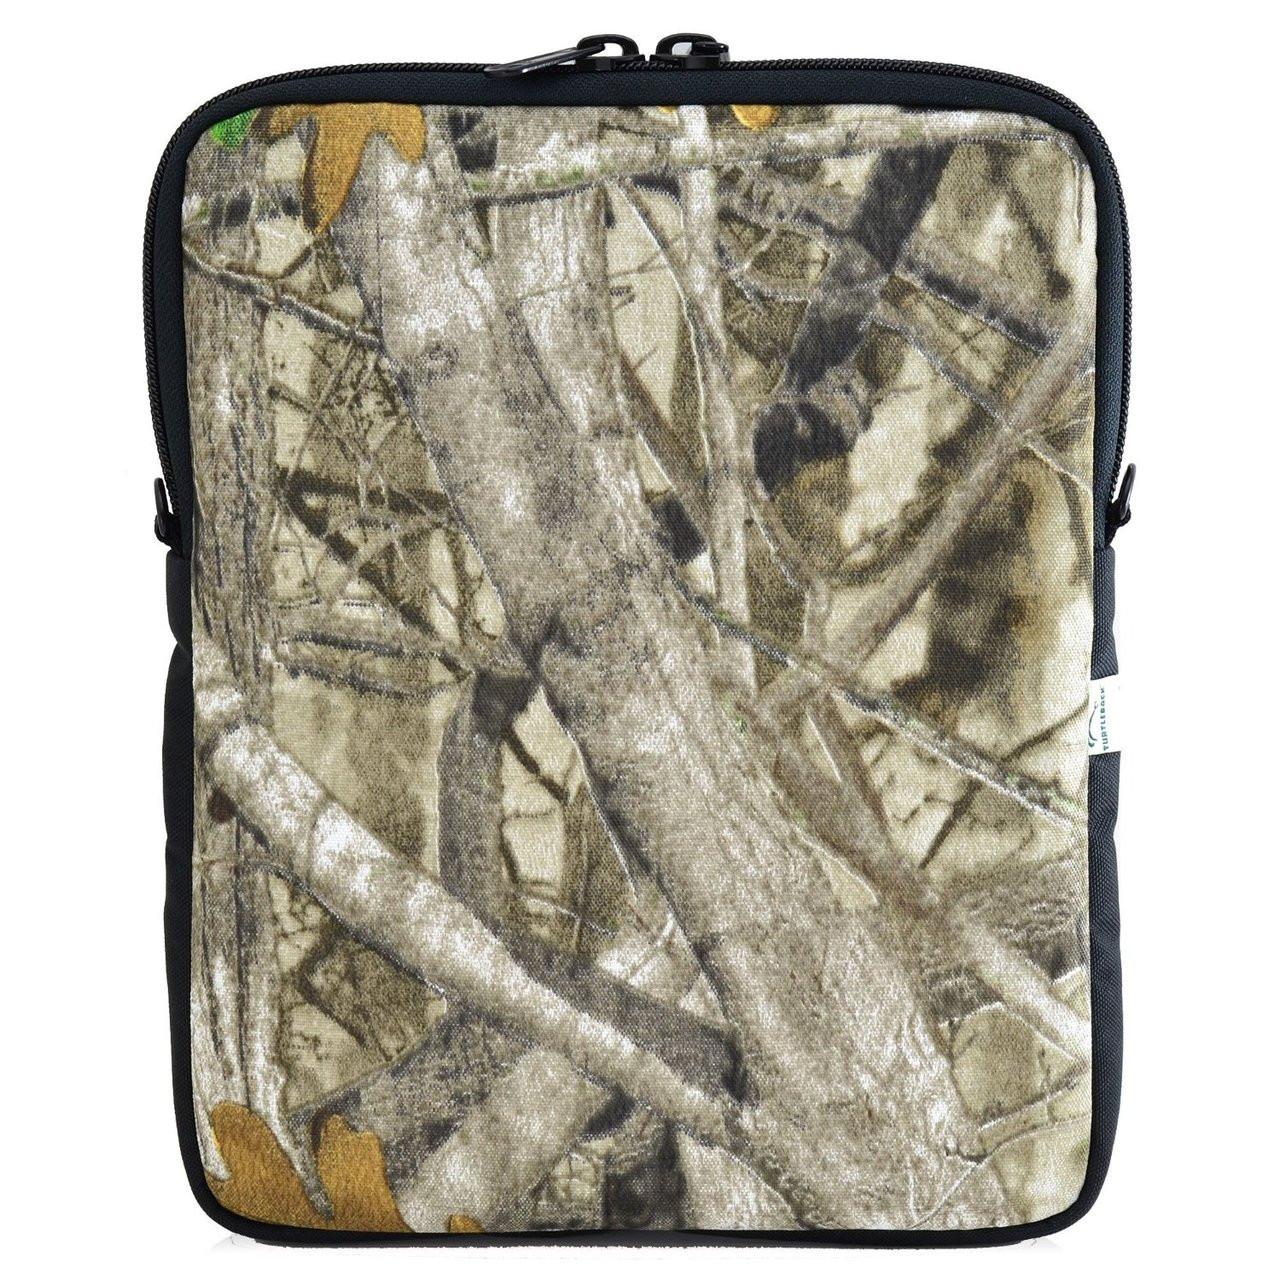 Camouflage Universal Tablet Bag